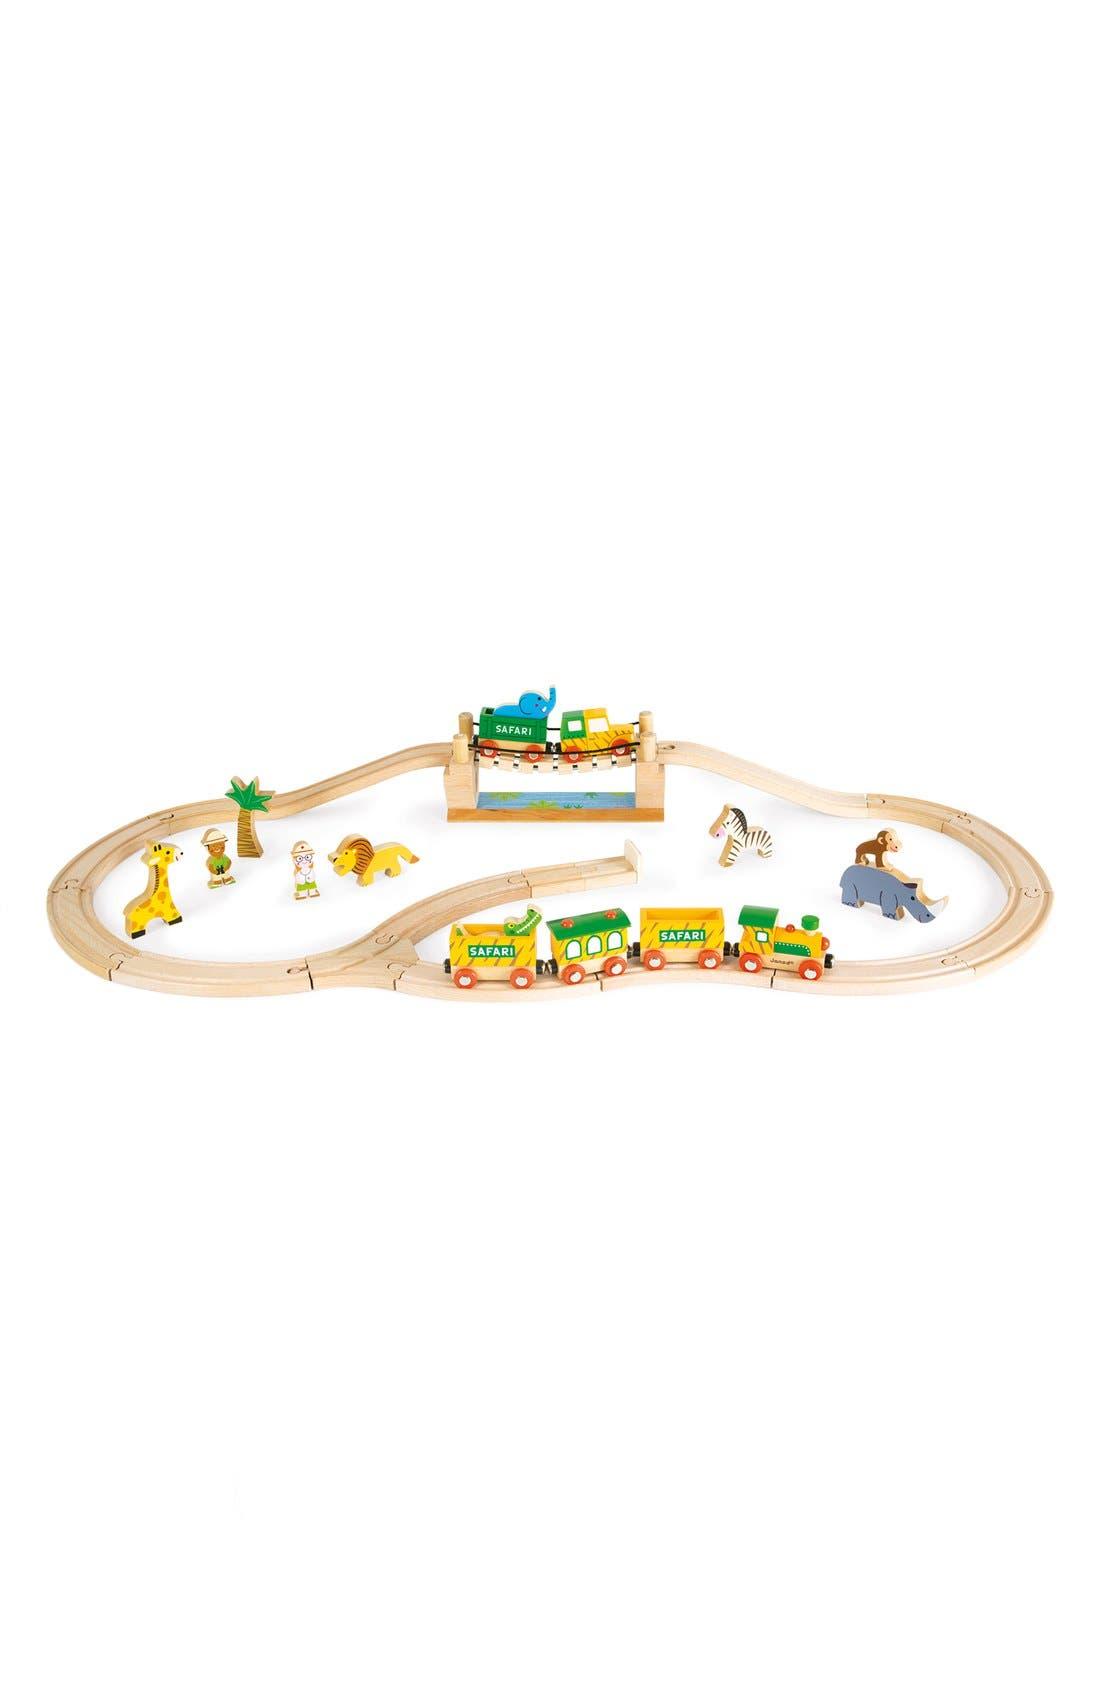 'Story Express - Safari' Train Set,                             Main thumbnail 1, color,                             600